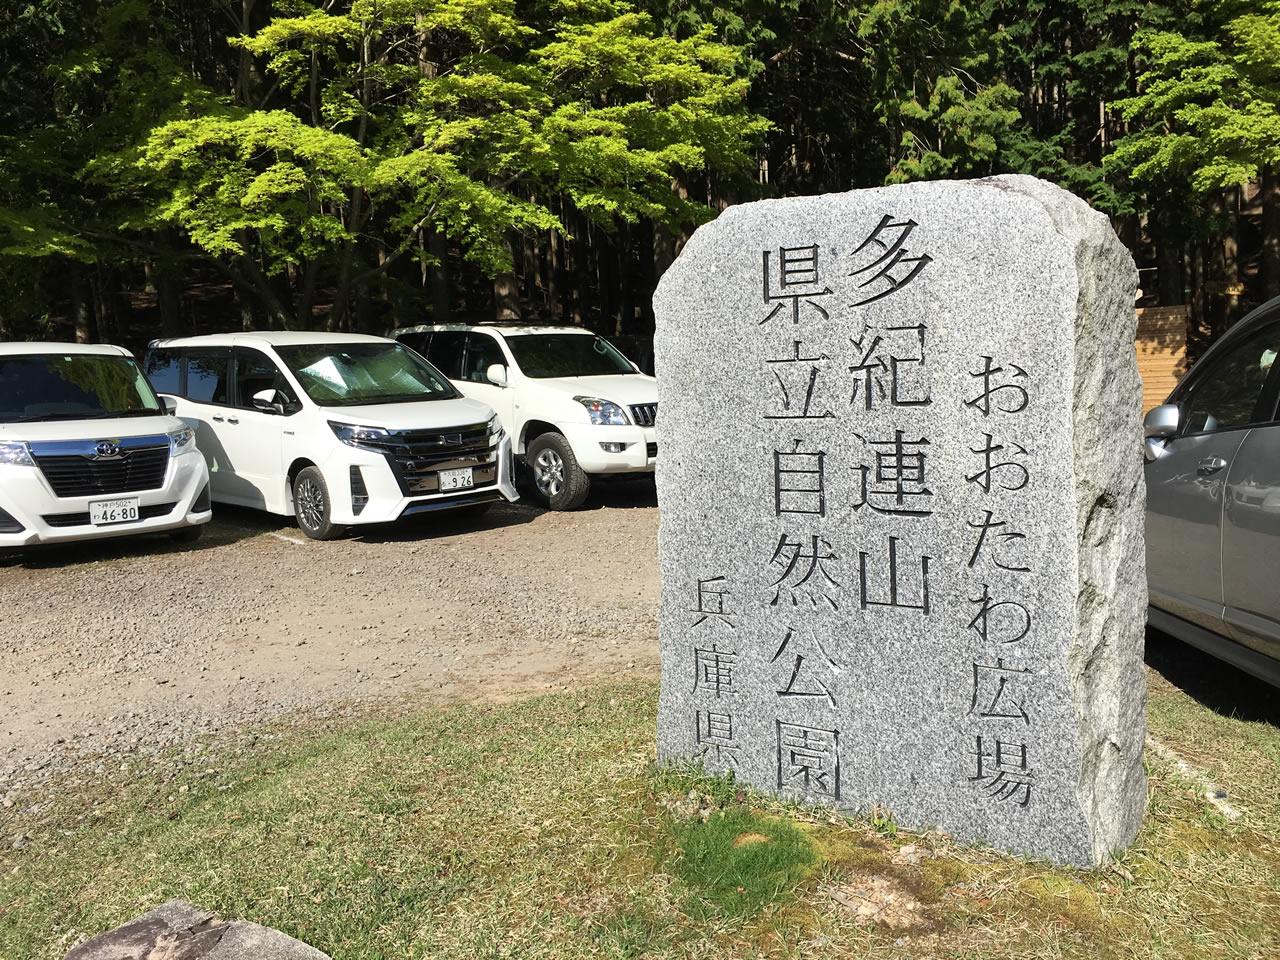 多紀連山県立自然公園に到着